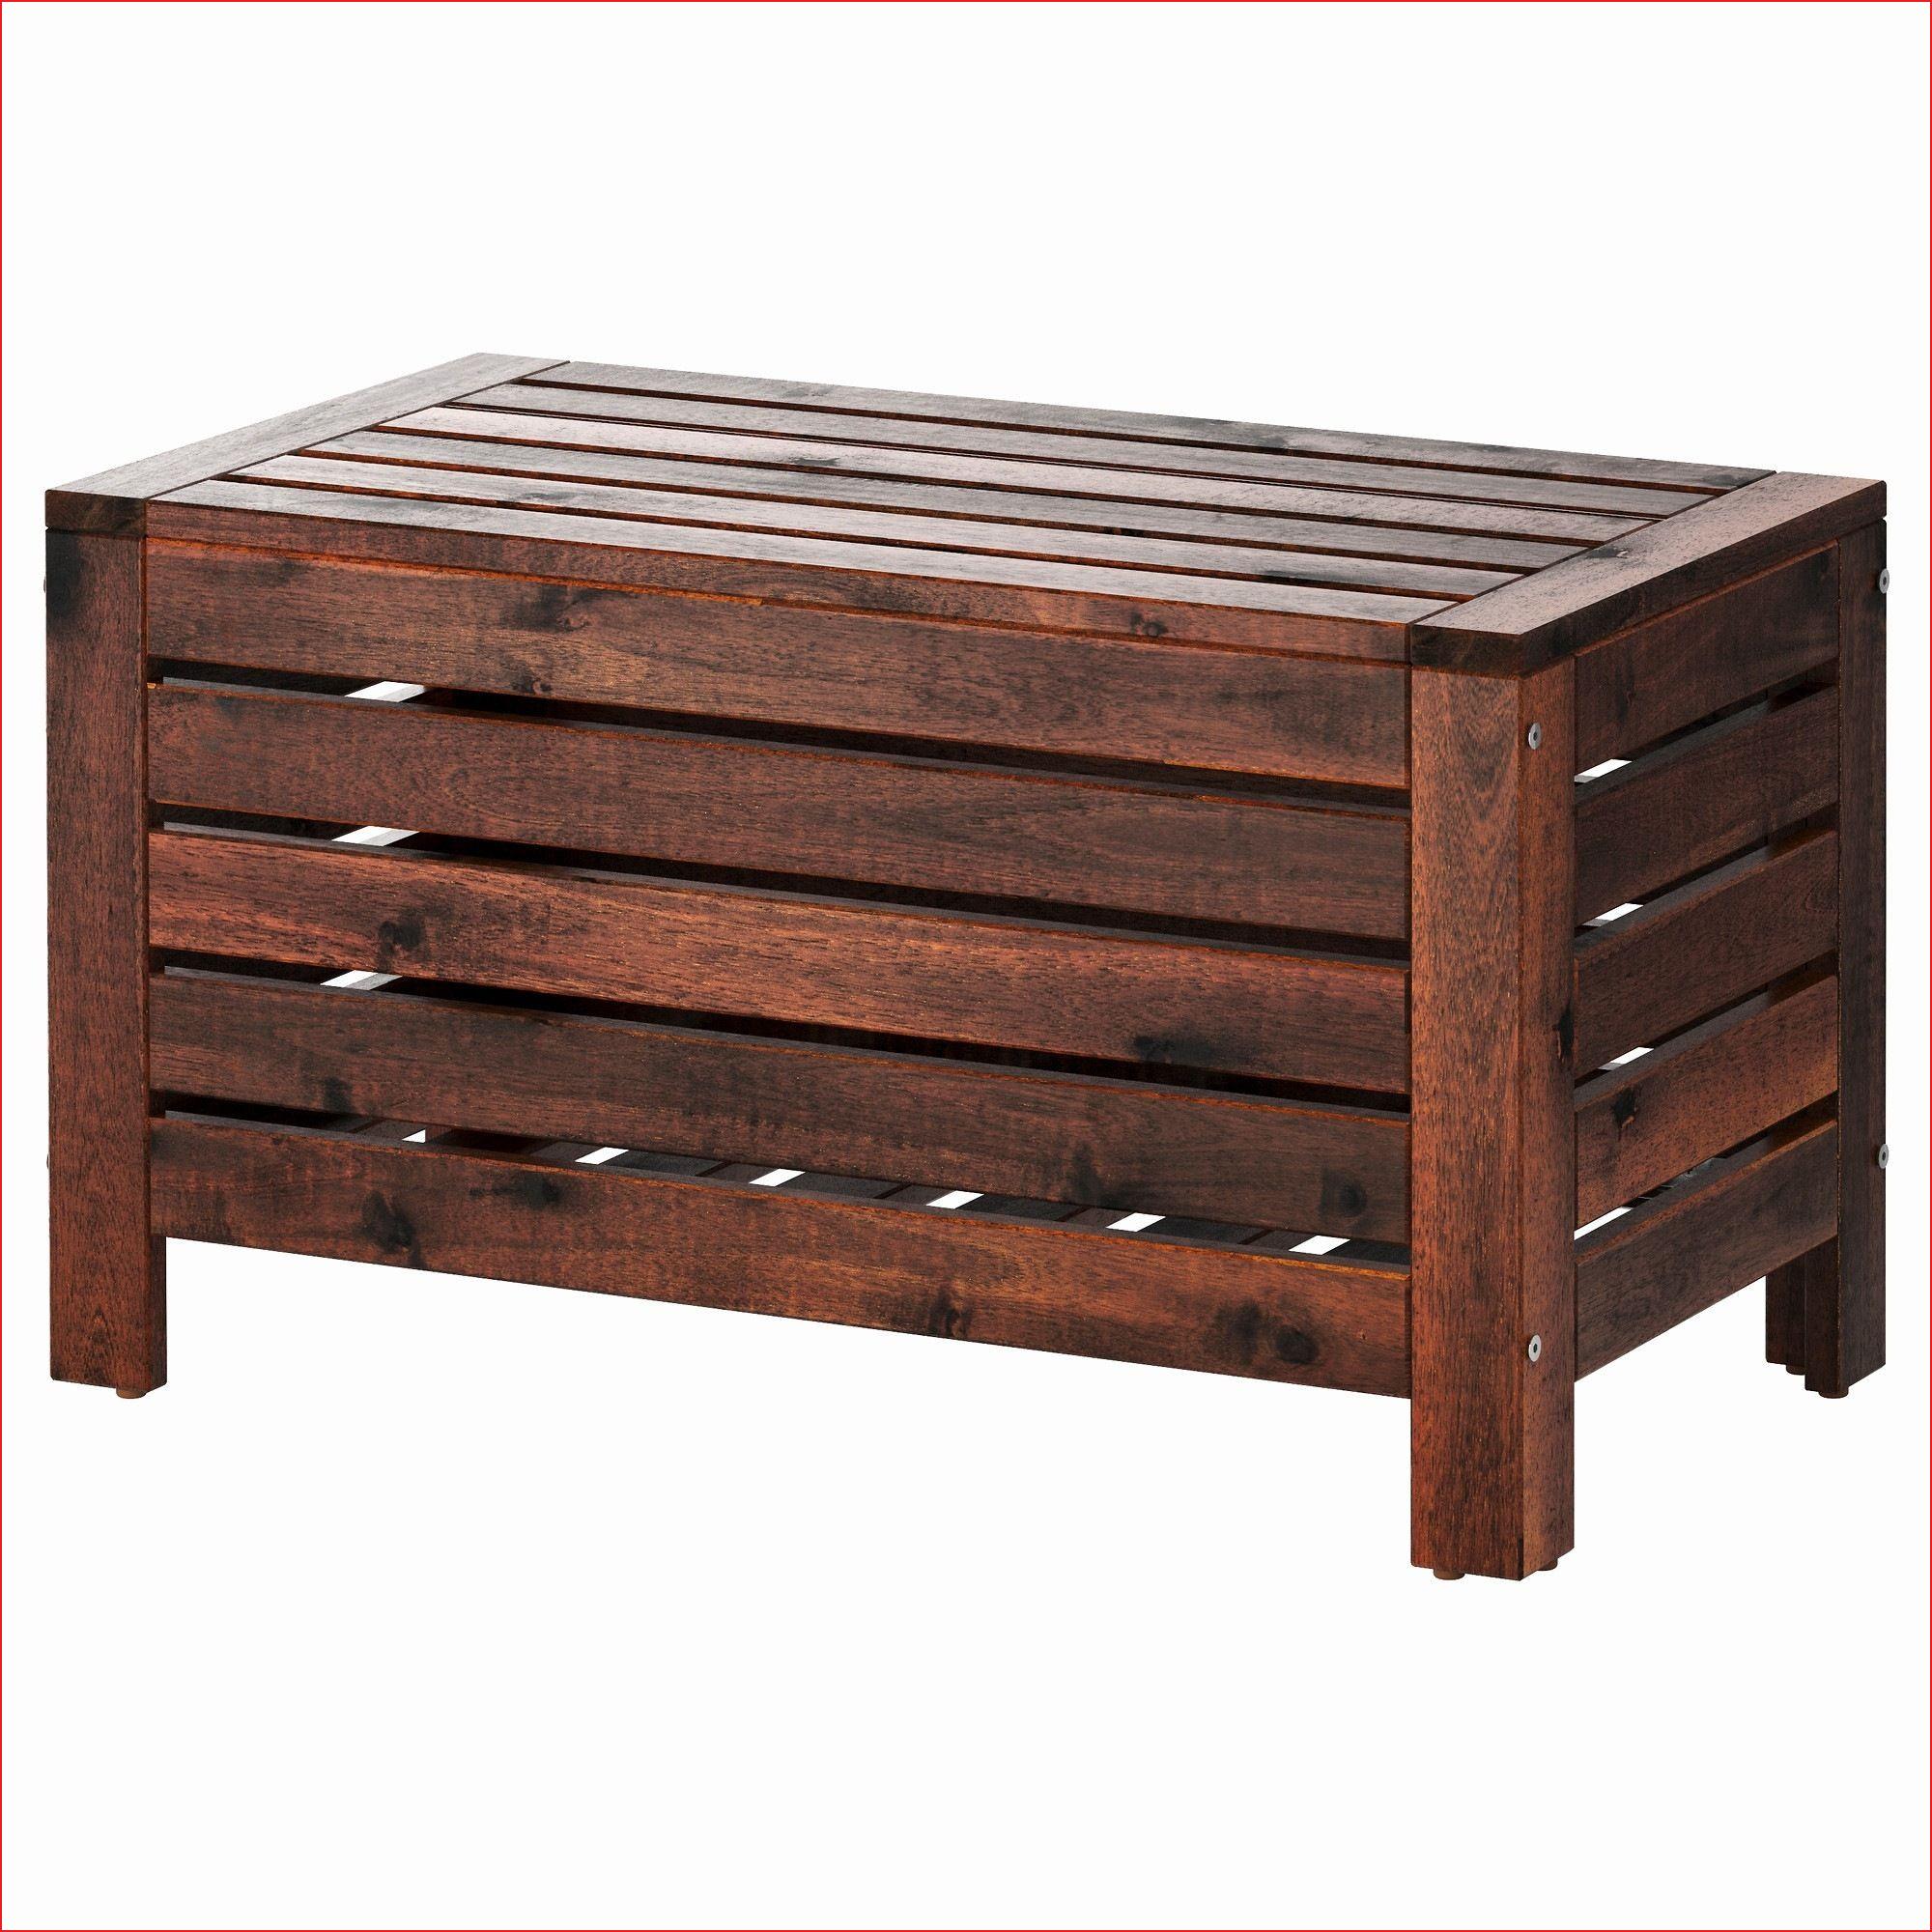 Prendre Un Coffre De Jardin Ikea Collection De Jardin Idée ... pour Coffre Jardin Ikea